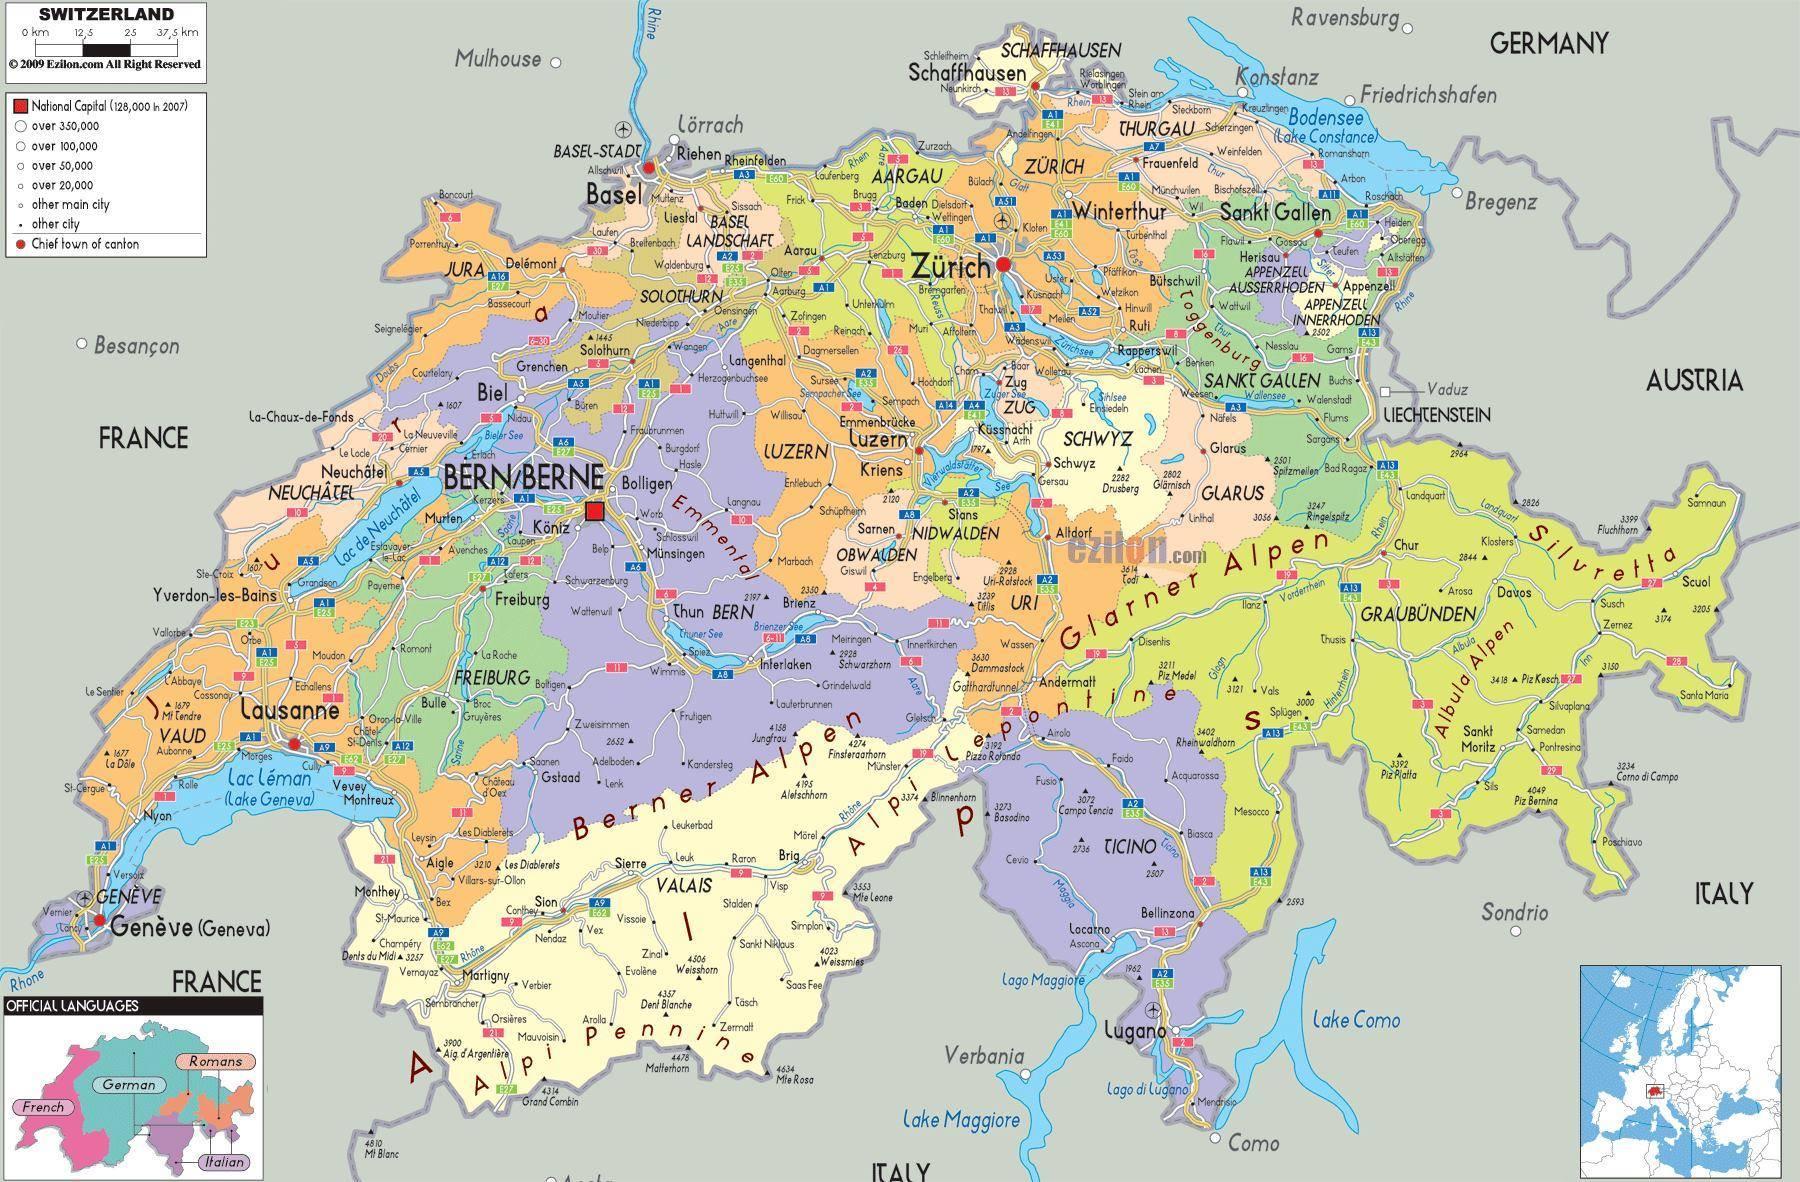 Cartina Geografica Politica Svizzera.Mappa Della Svizzera Cartina Della Svizzera